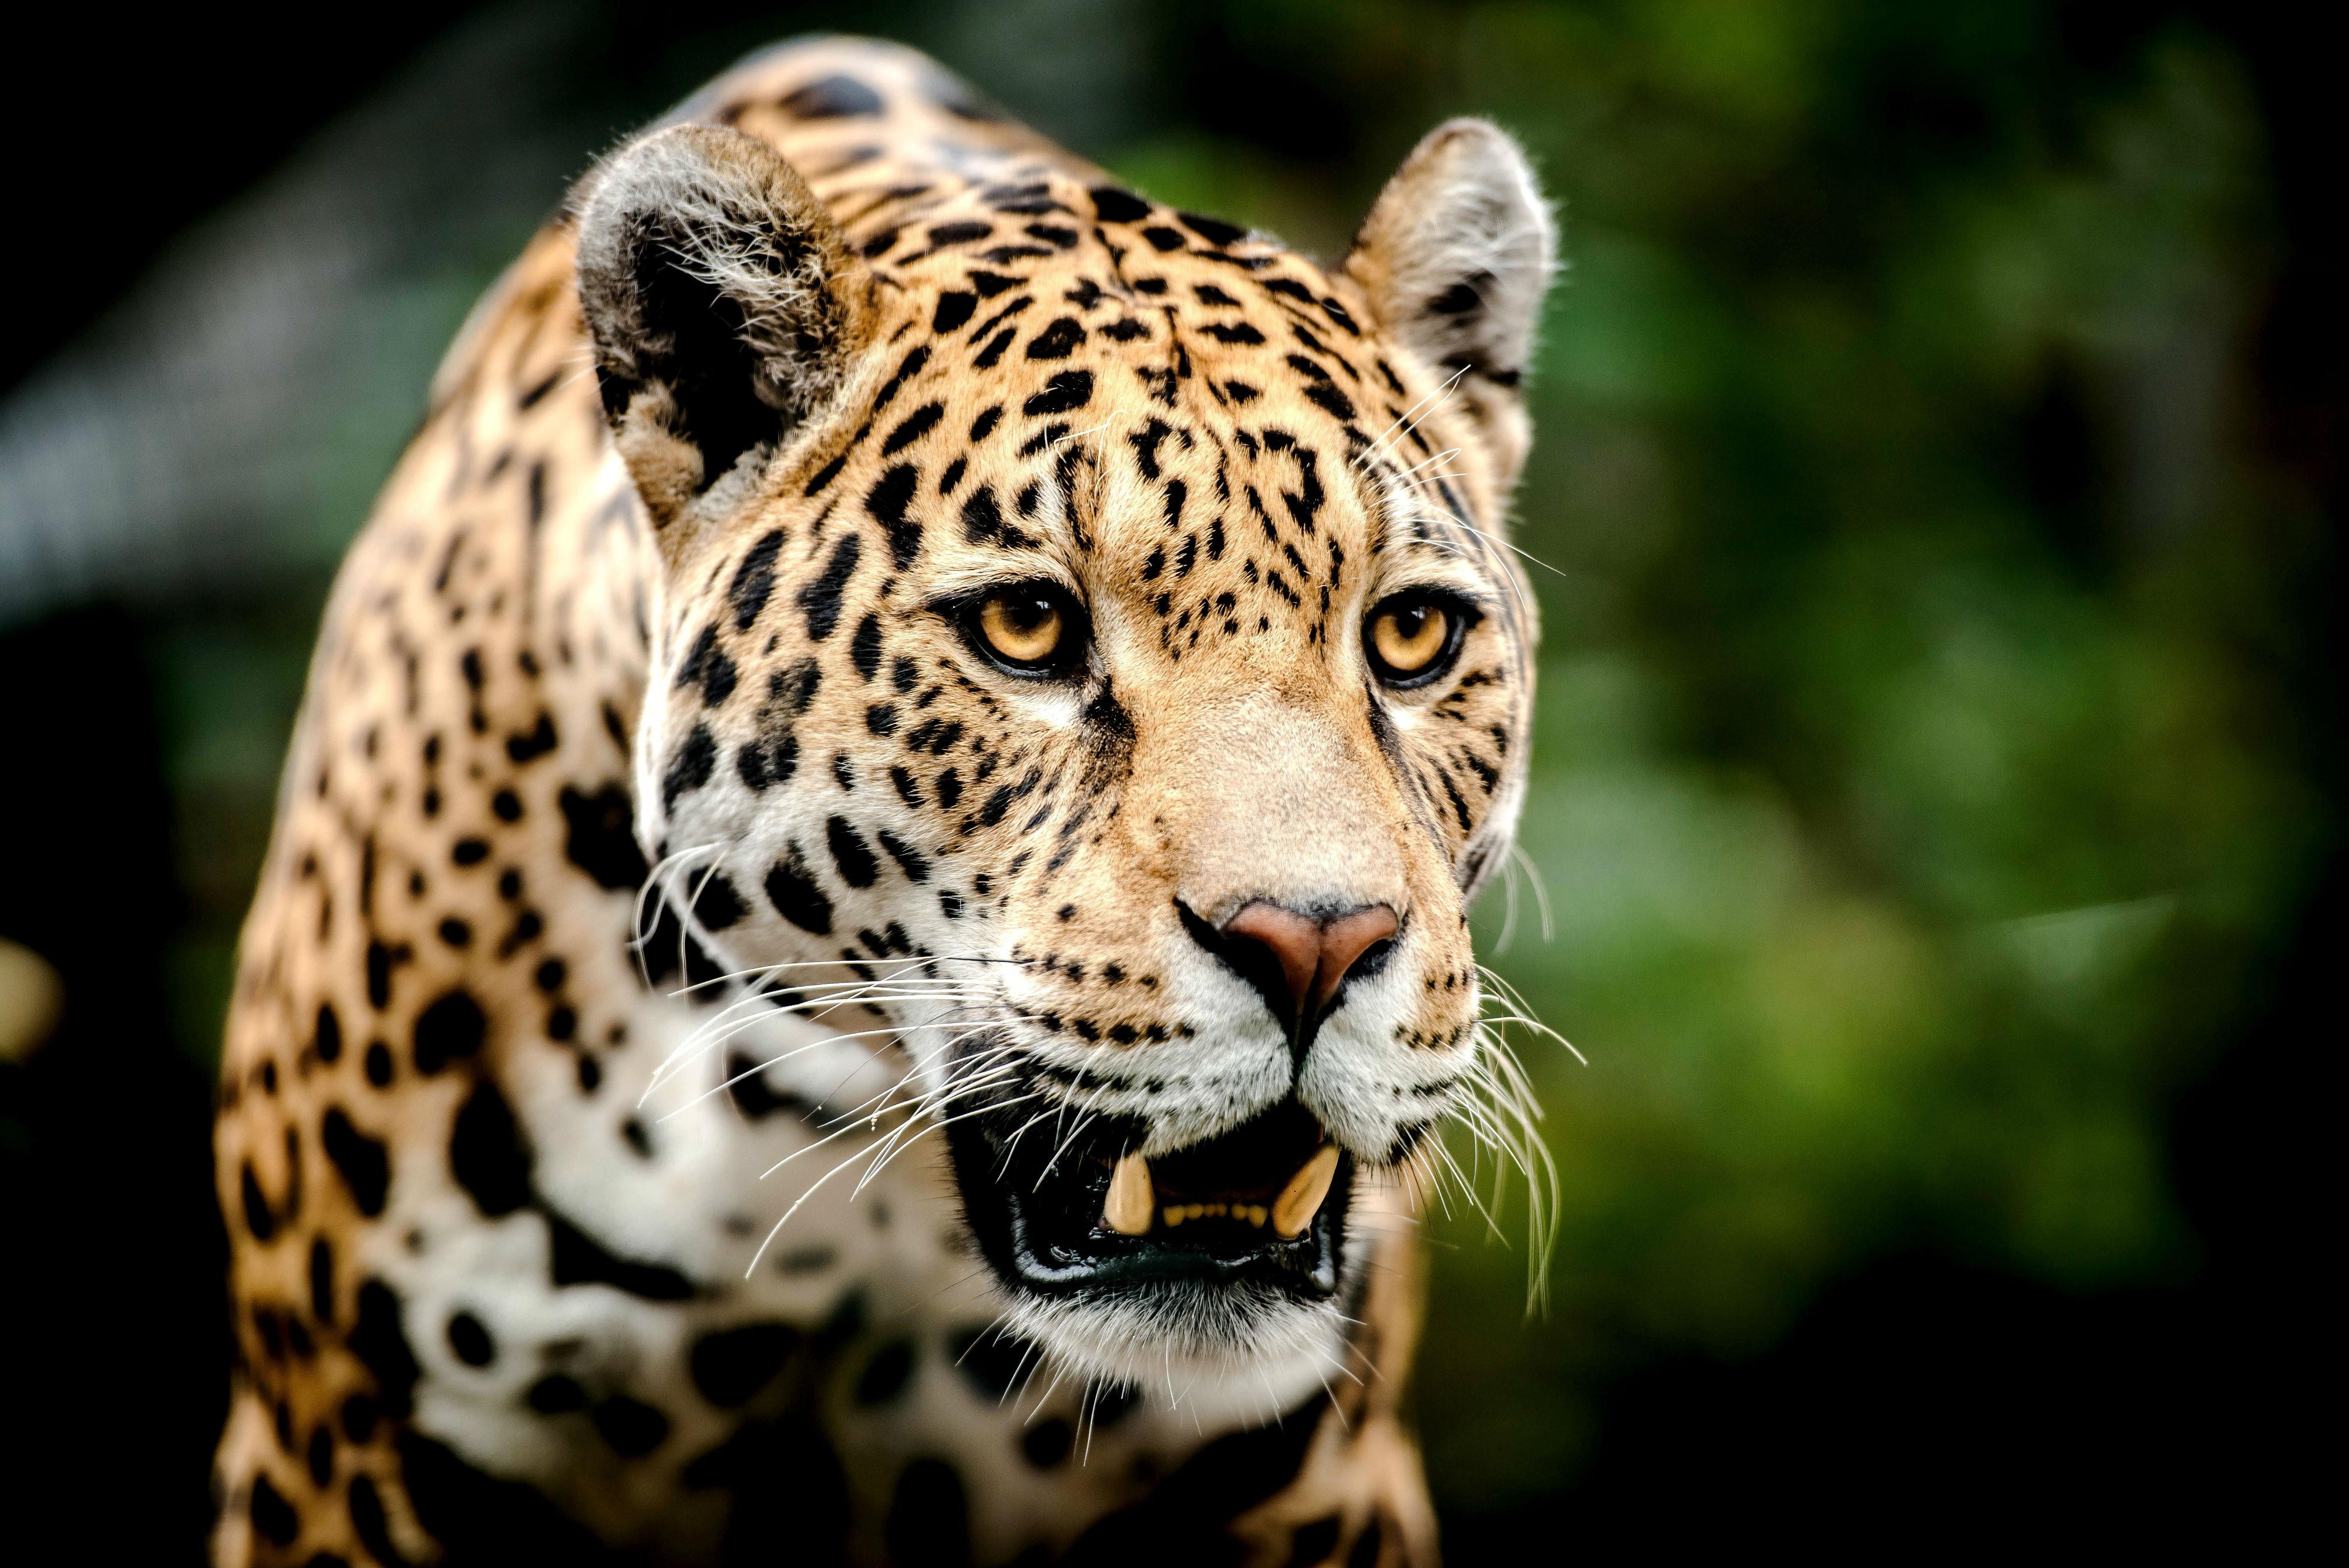 Leopard Face Wallpaper